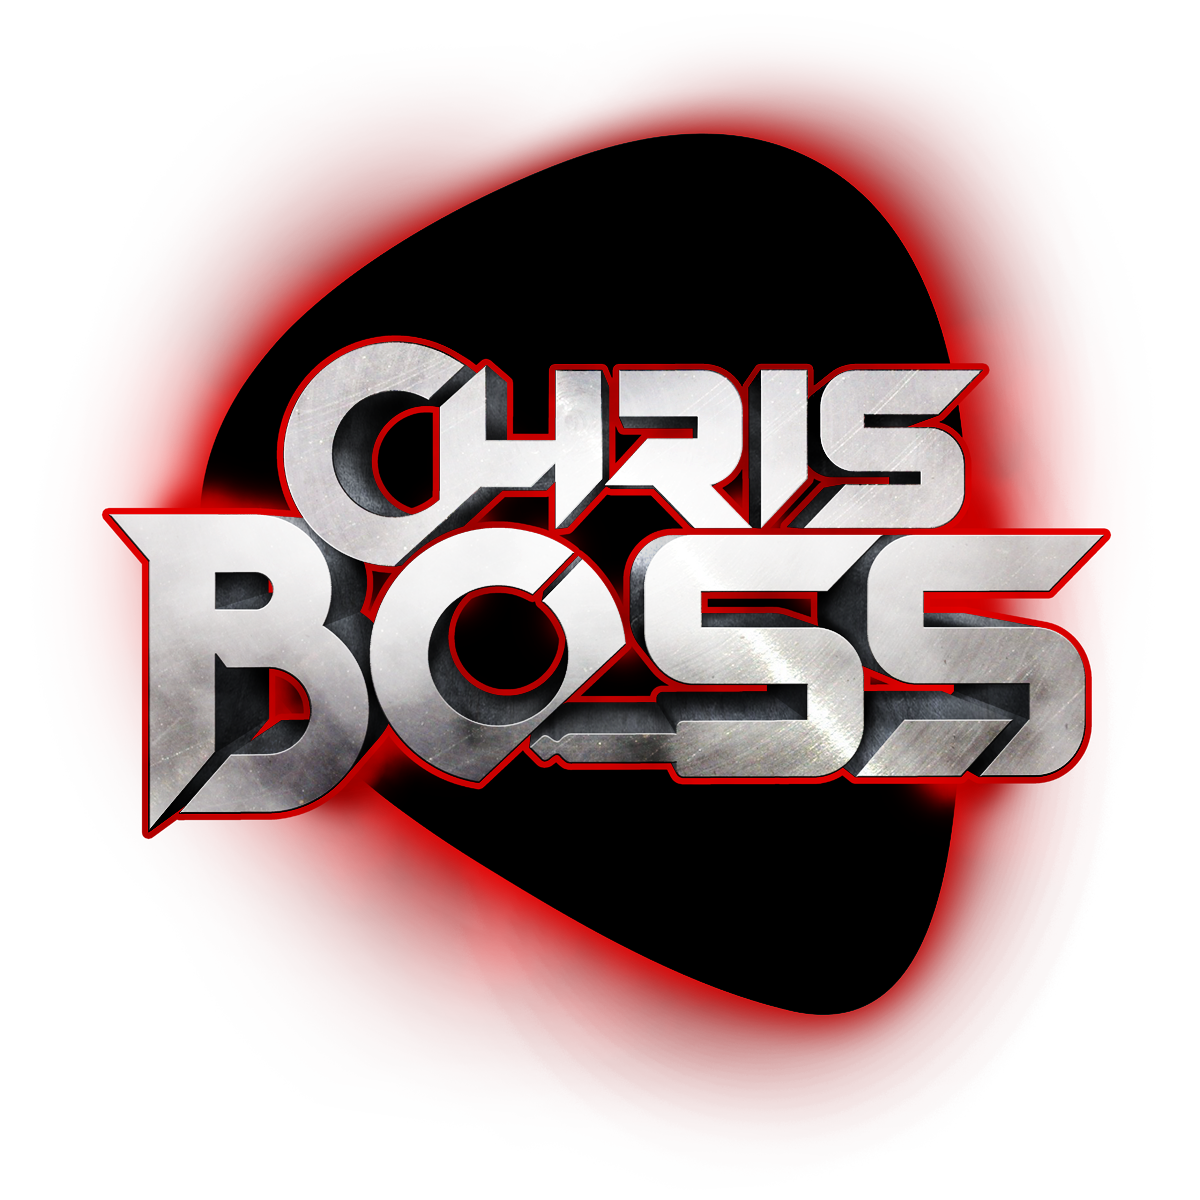 Chris Boss